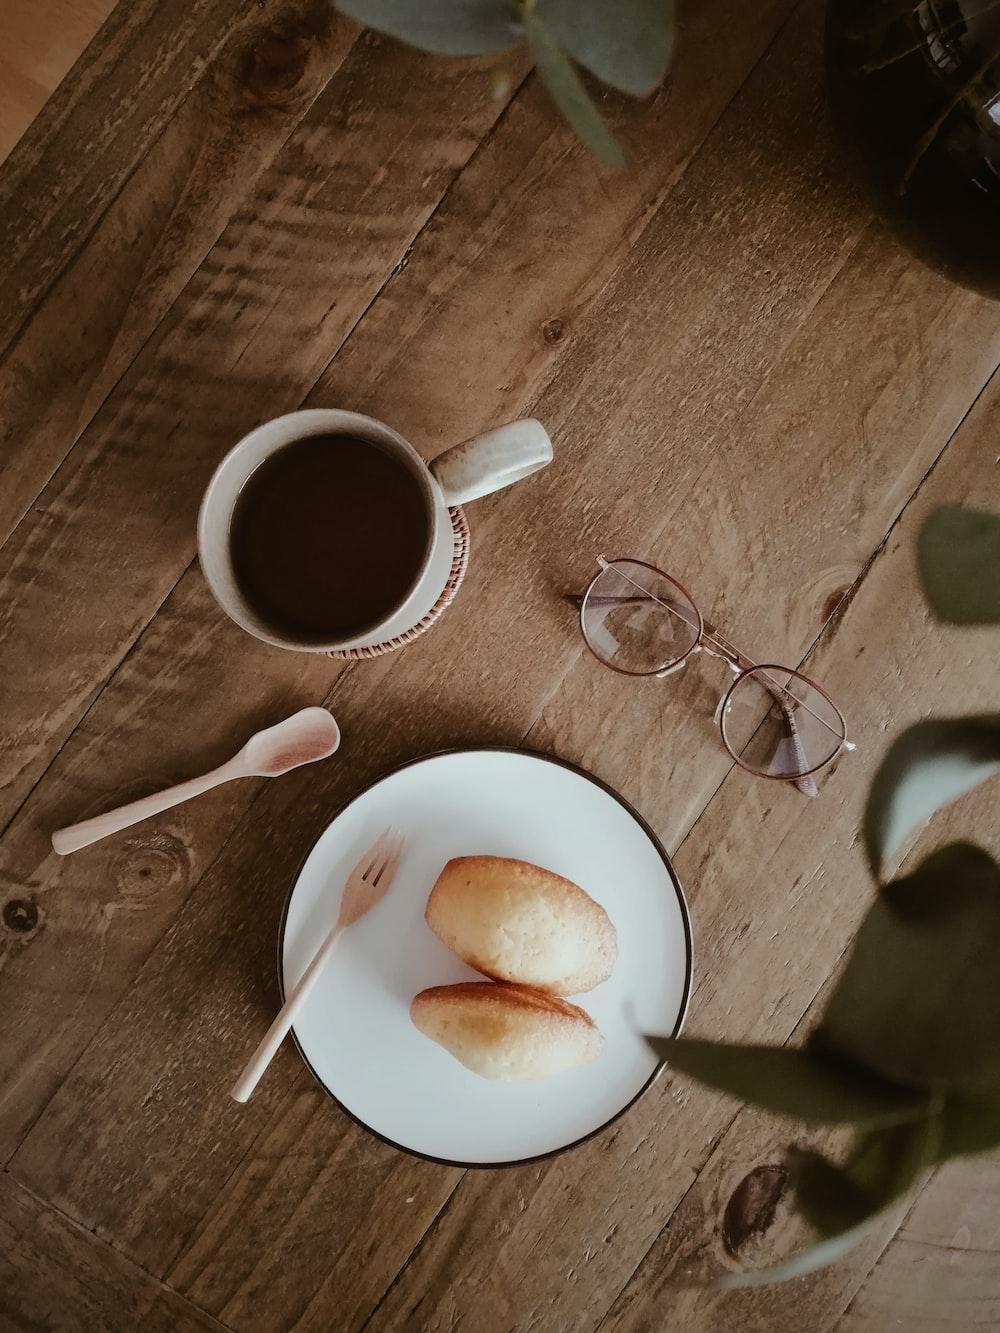 white ceramic mug beside stainless steel spoon on brown wooden table